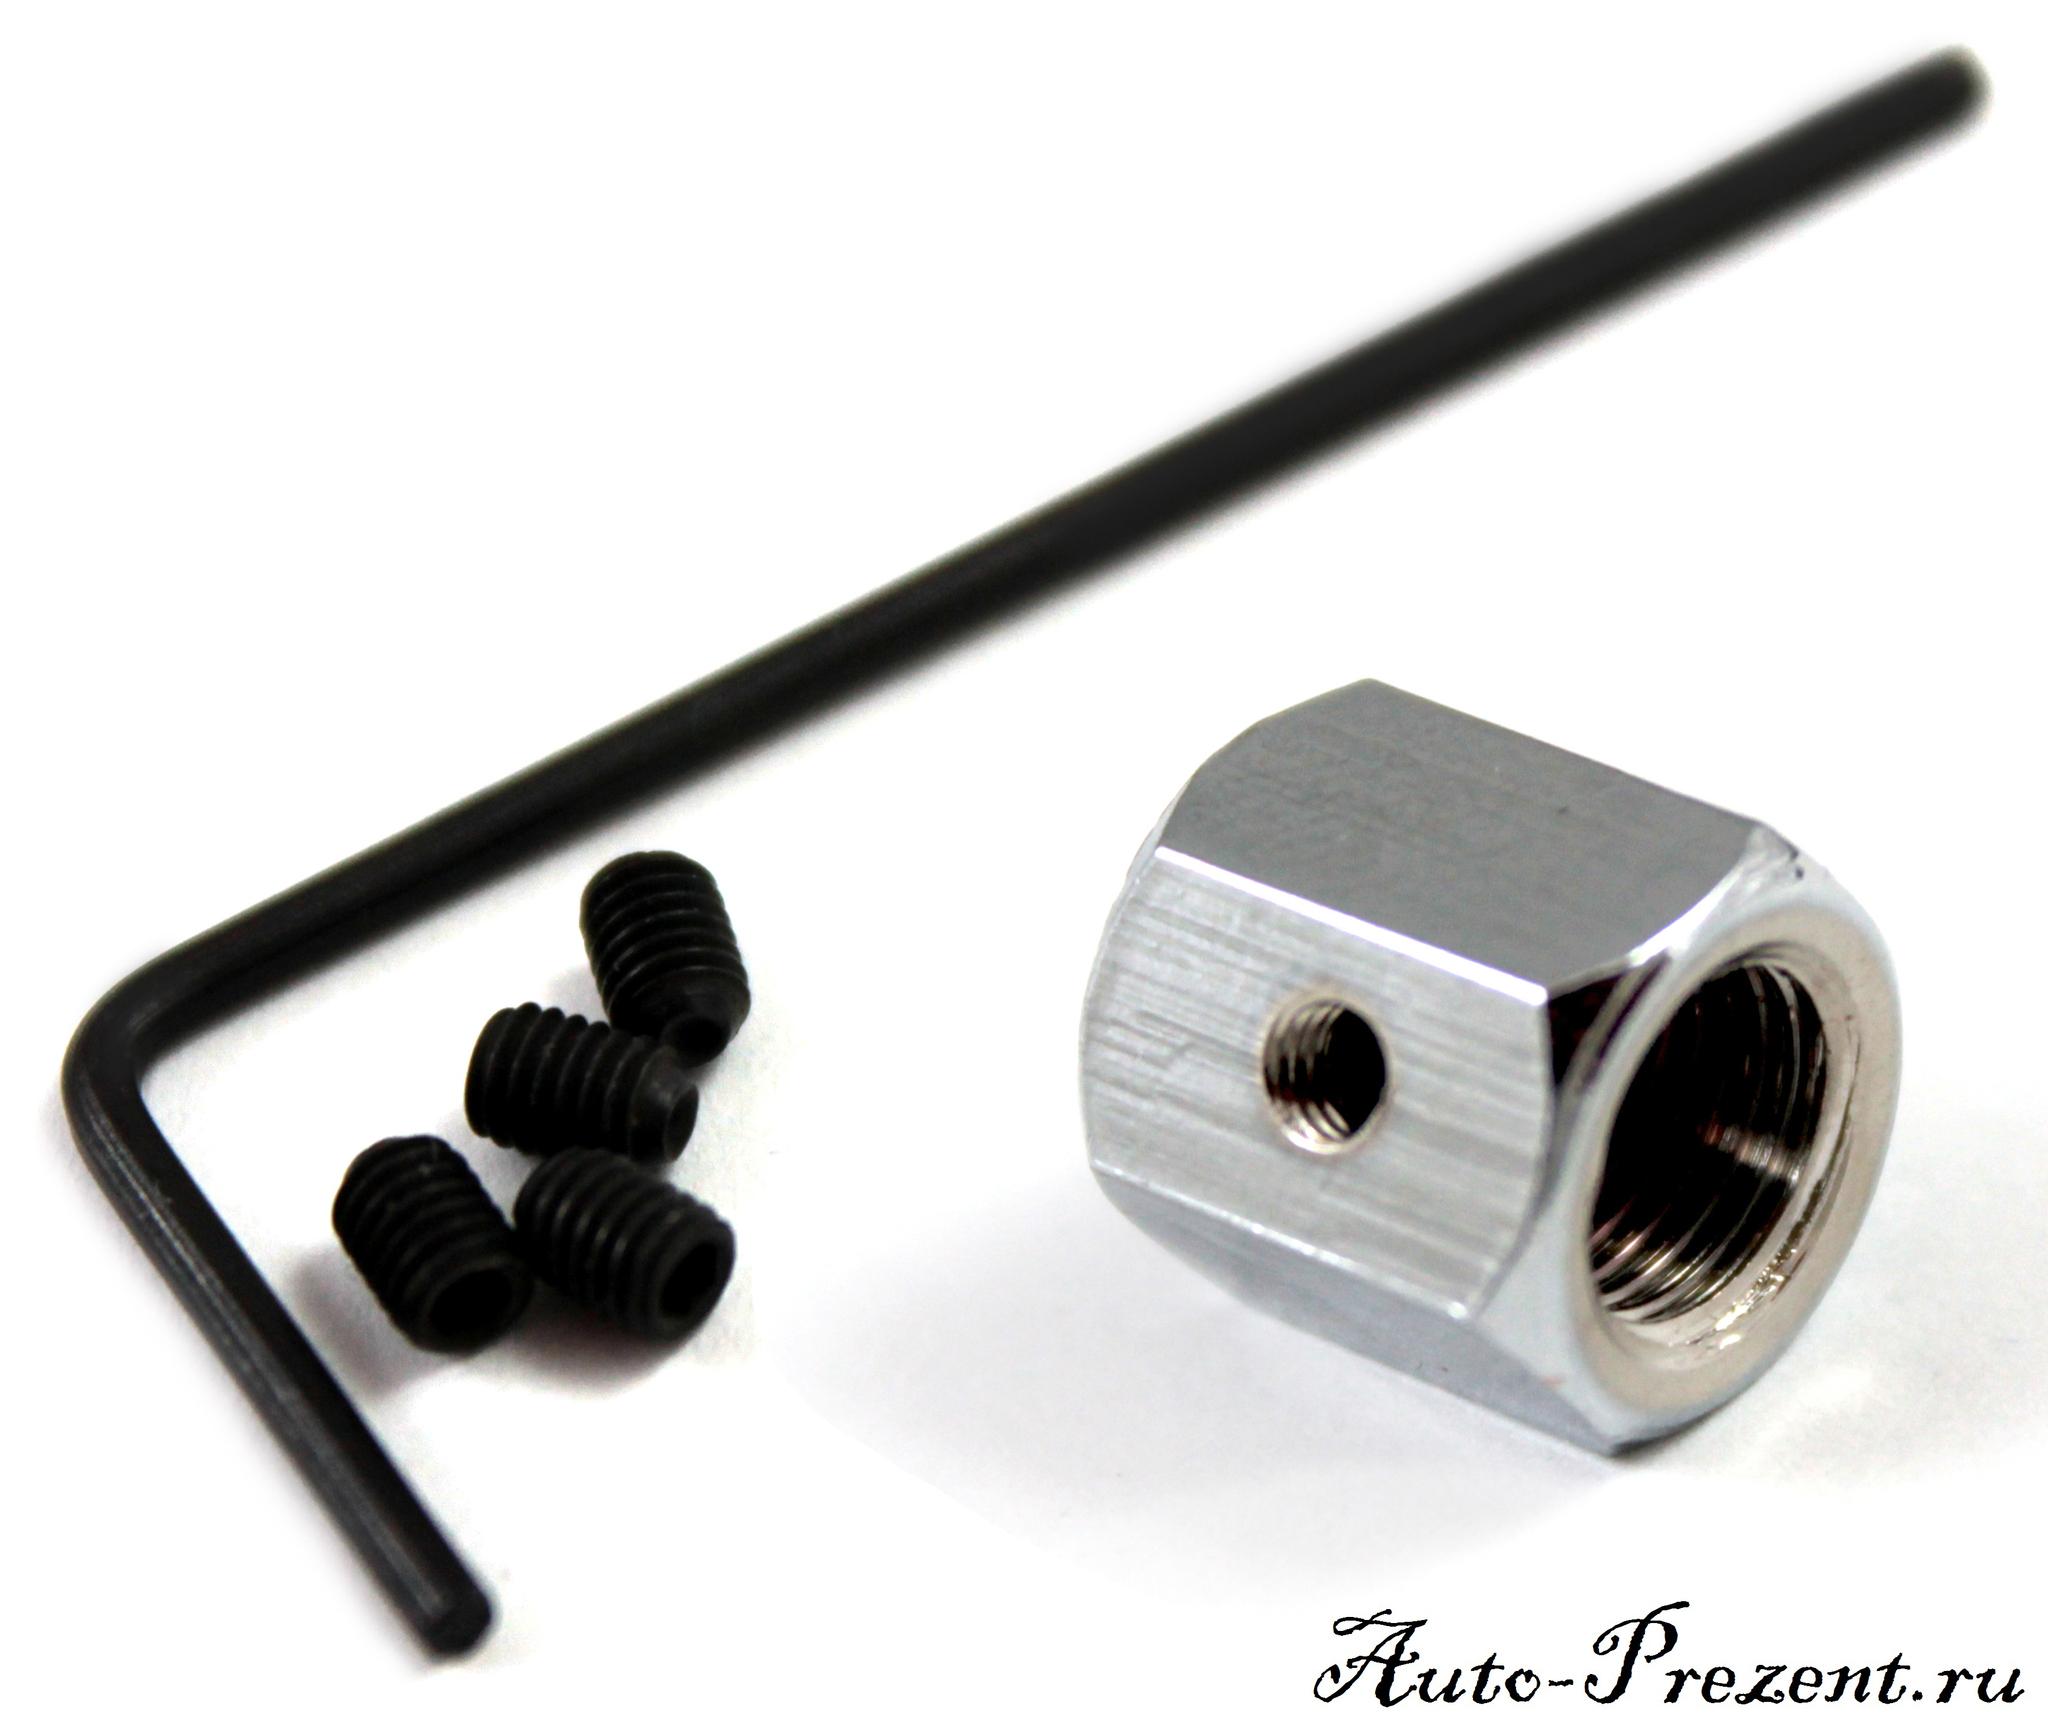 Колпачки на ниппель INFINITI с защитой от кражи